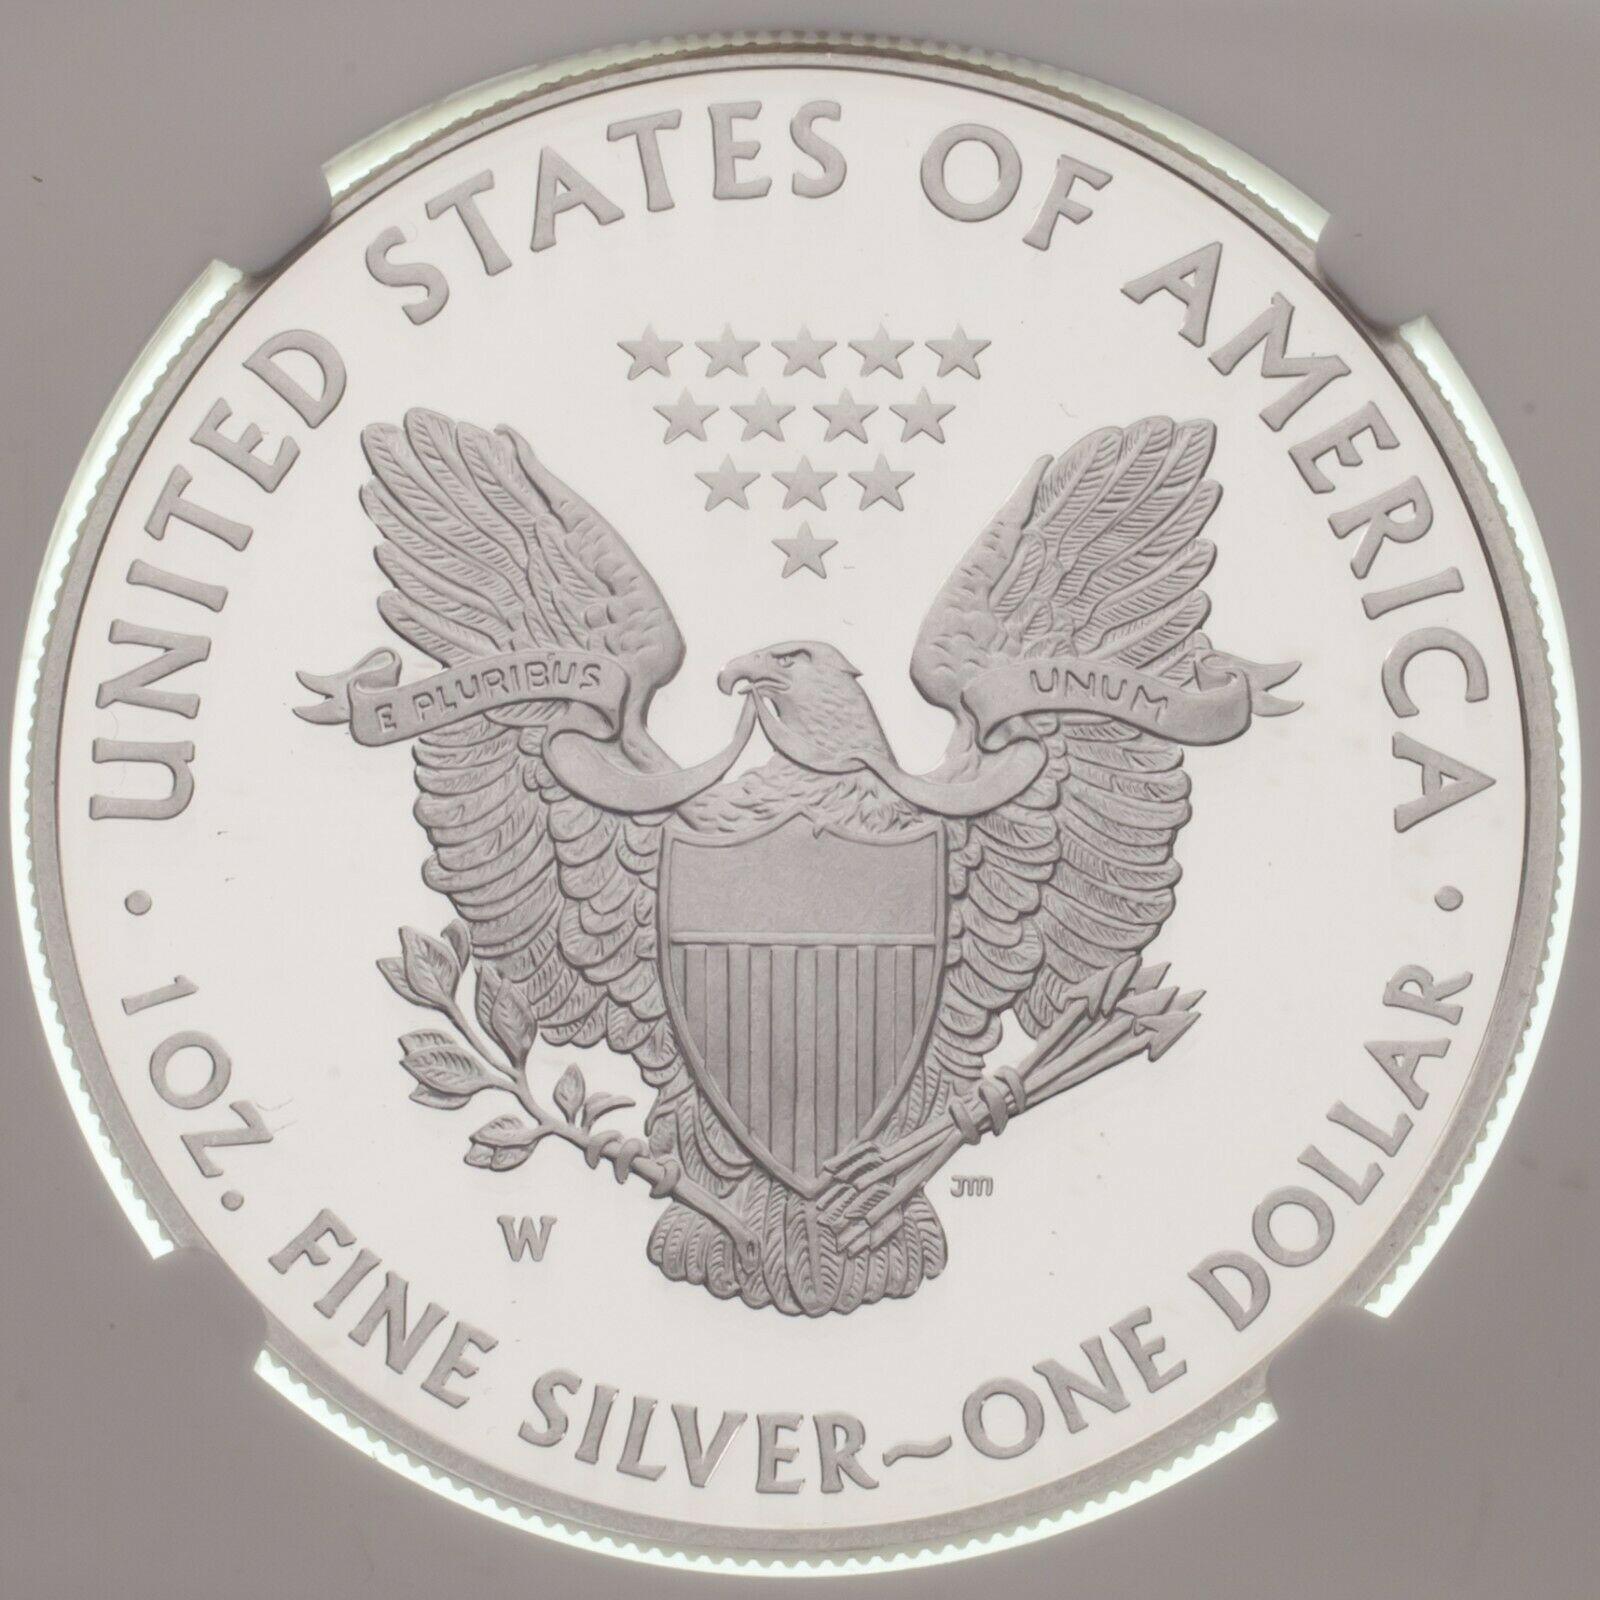 2013-W Silber American Eagle Beweis Ausgewählten von NGC As PF70 Ultra Cameo image 4